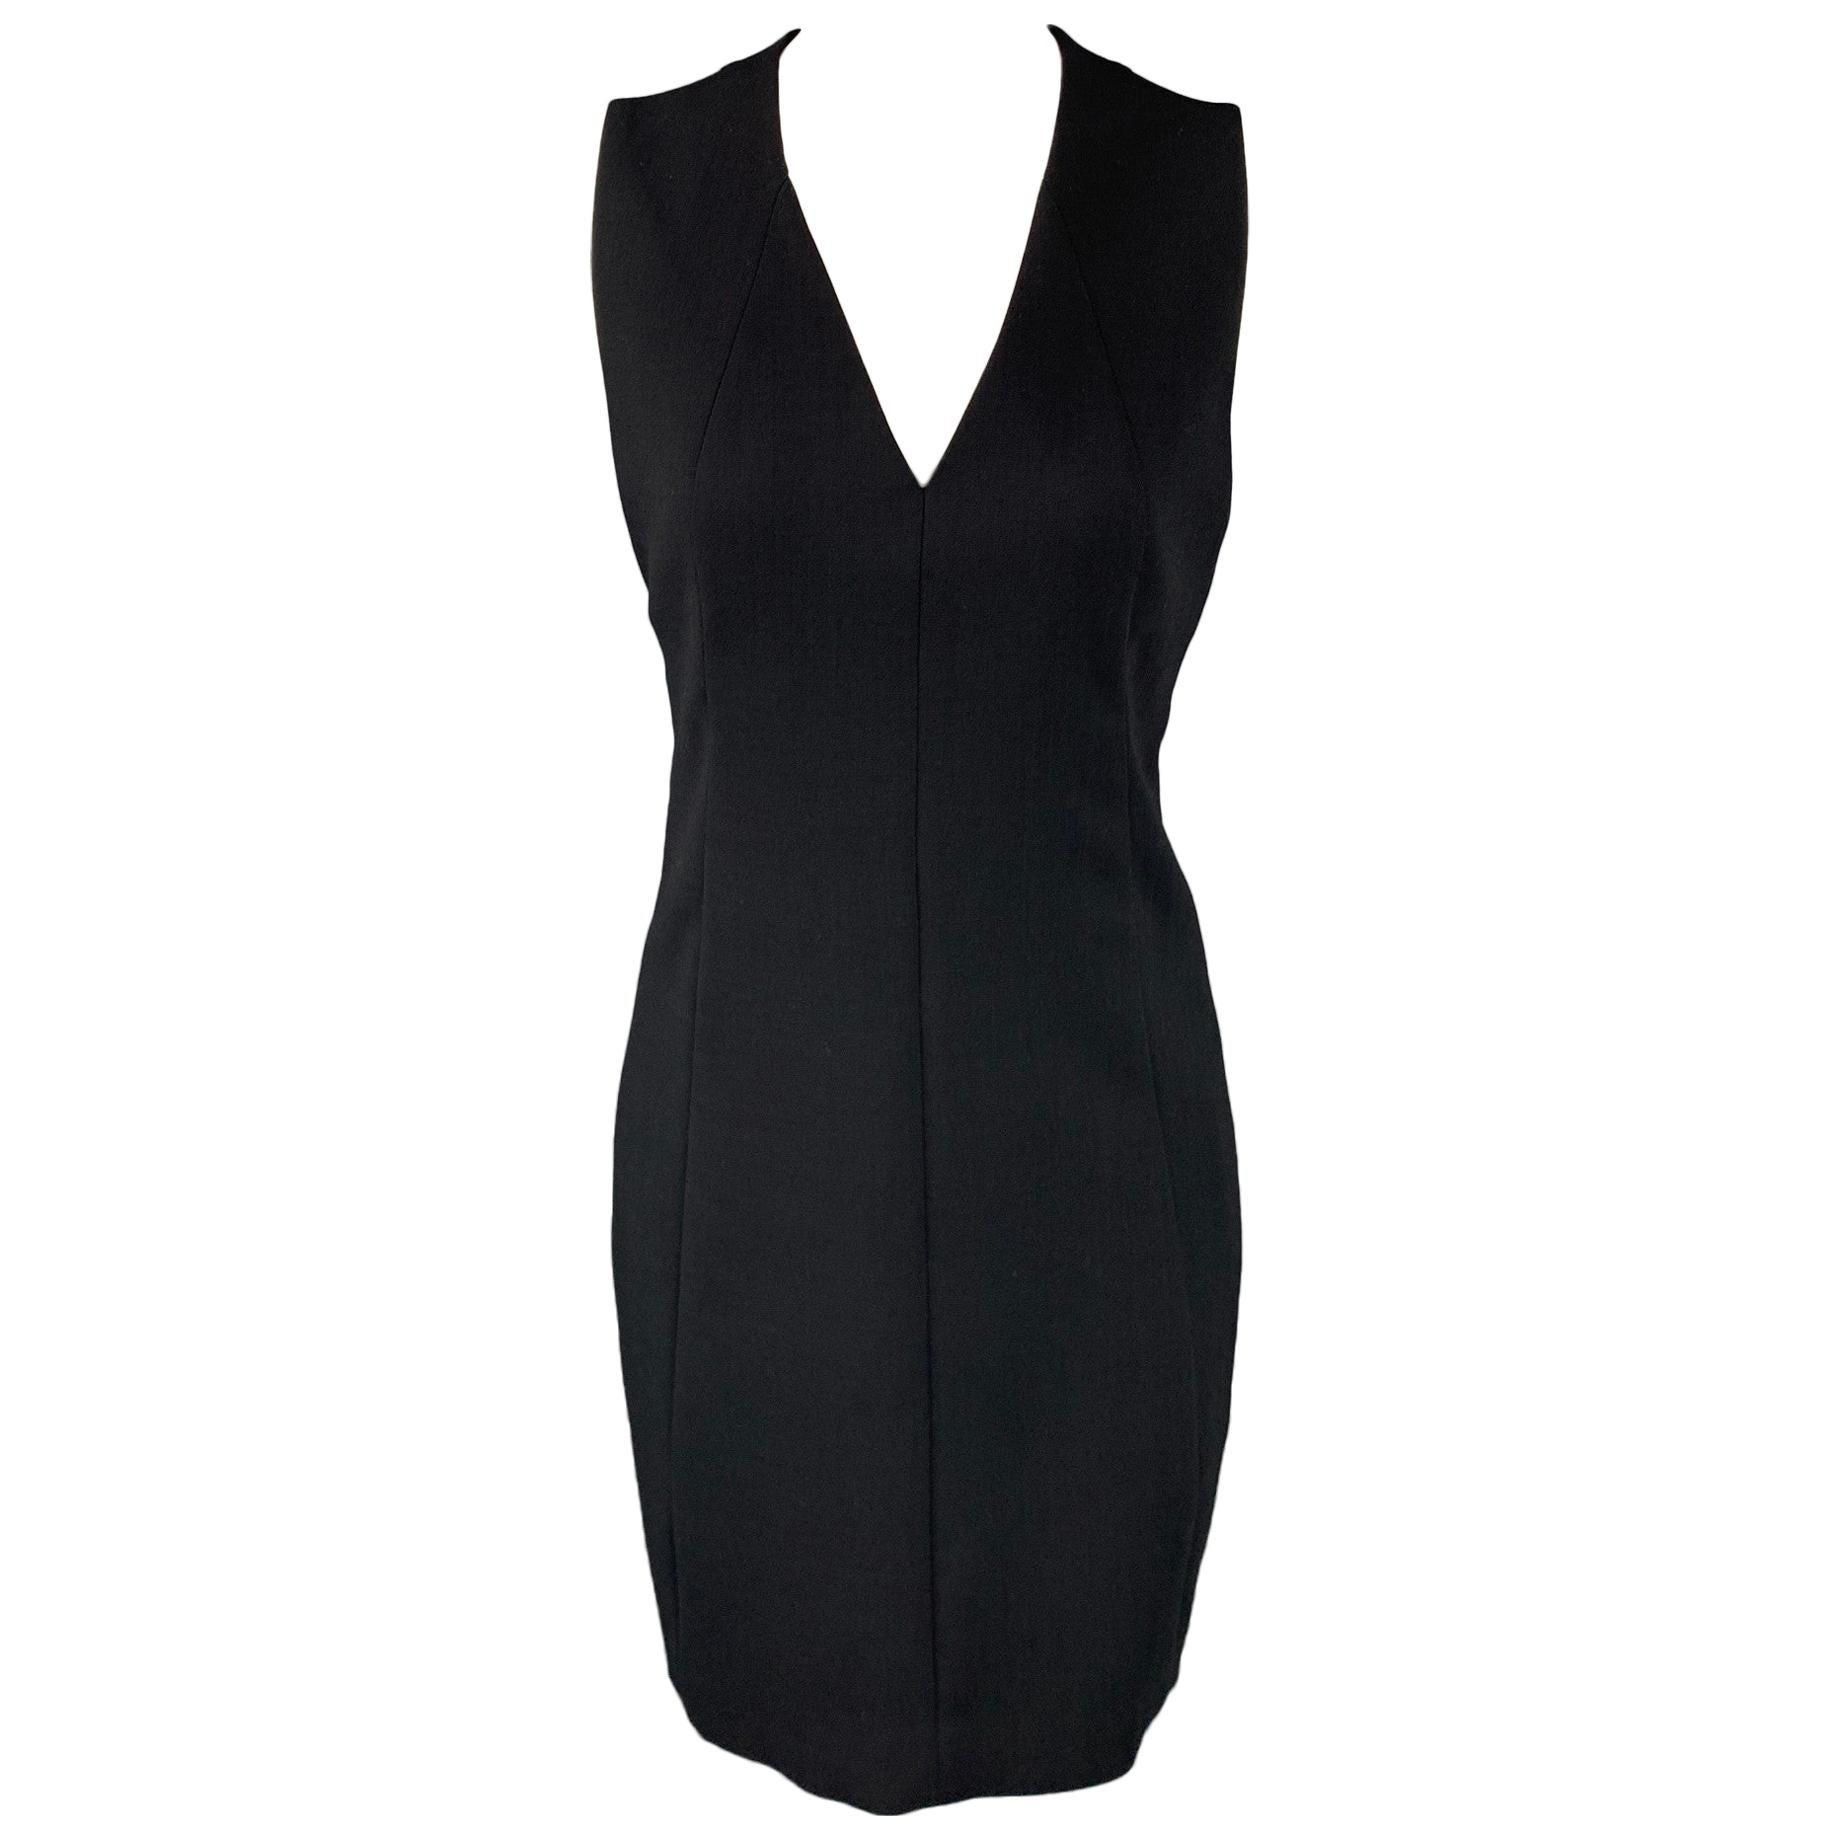 AKRIS Size 6 Black Wool / Nylon V-Neck Shift Dress